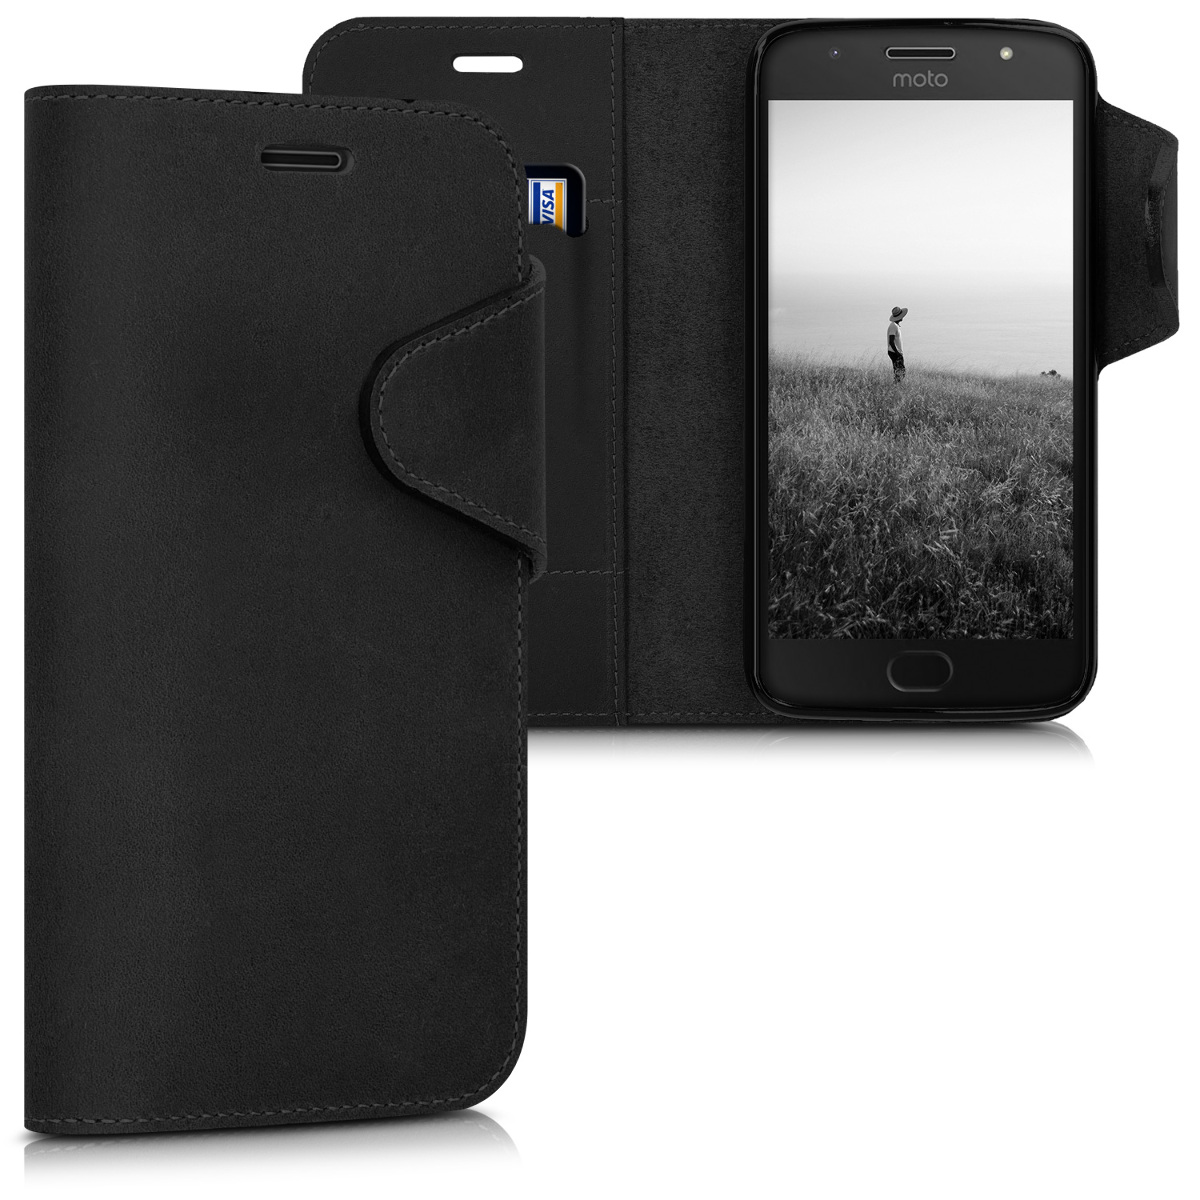 Kalibri Δερμάτινη Suede Θήκη - Πορτοφόλι Motorola Moto G5S - Black (42817.01)